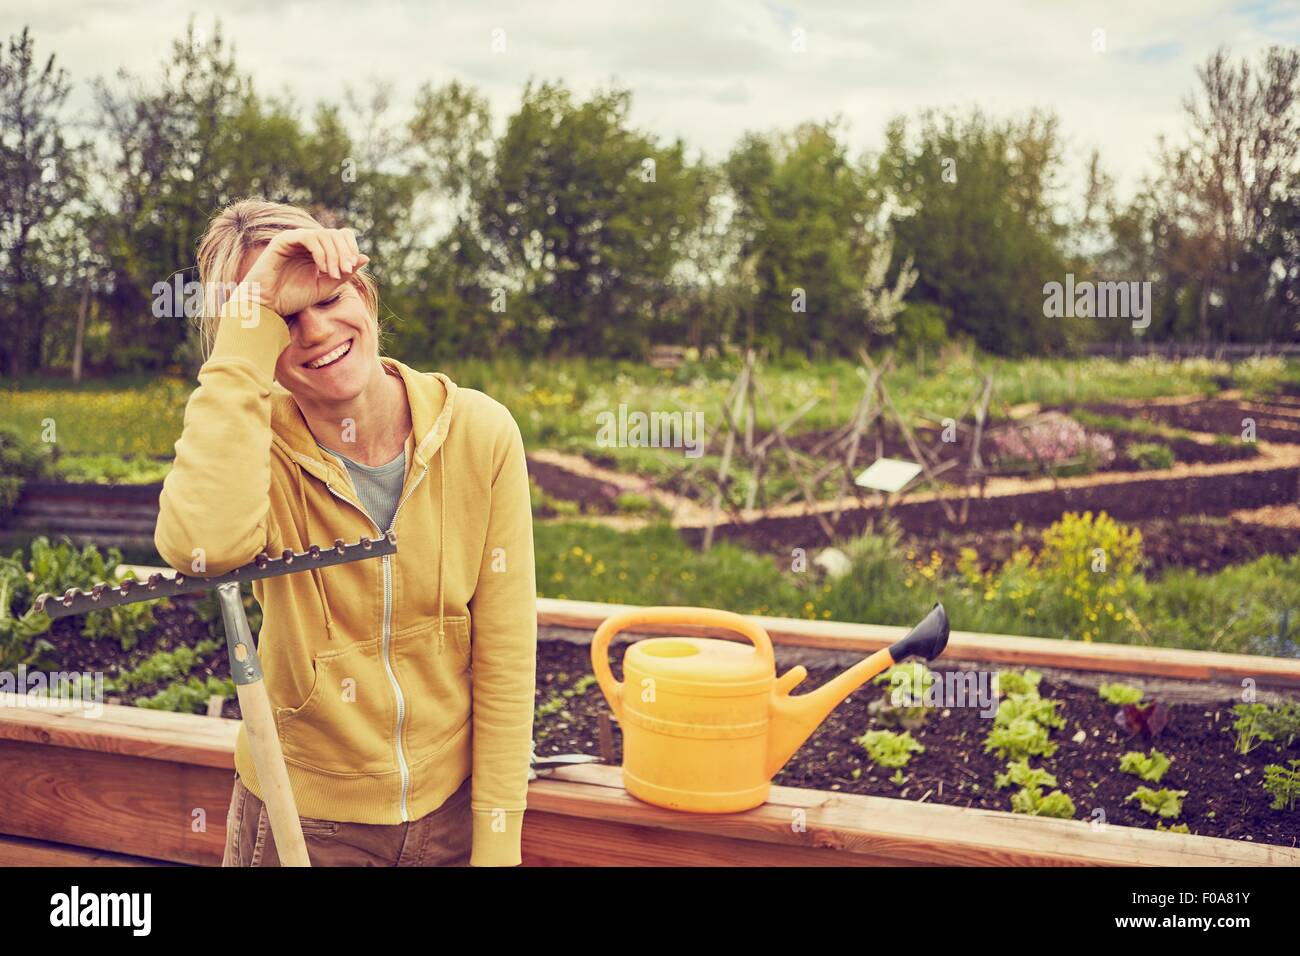 Femme mature, jardinage, appuyé sur le râteau, rire Photo Stock